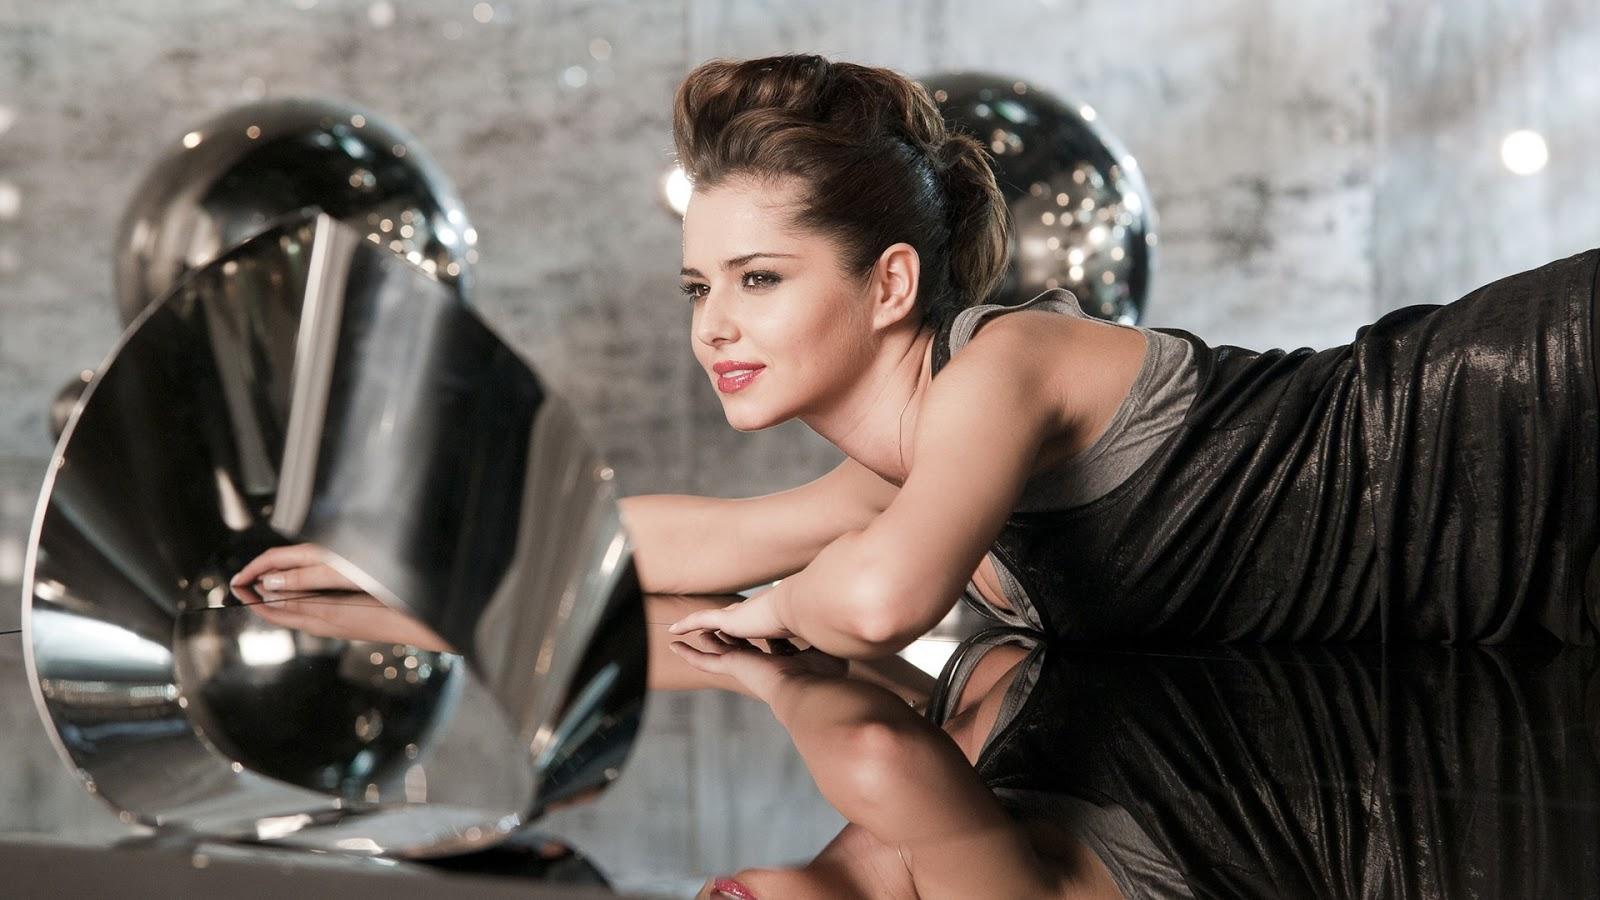 Cheryl Cole Seducing Hot Pics 2016